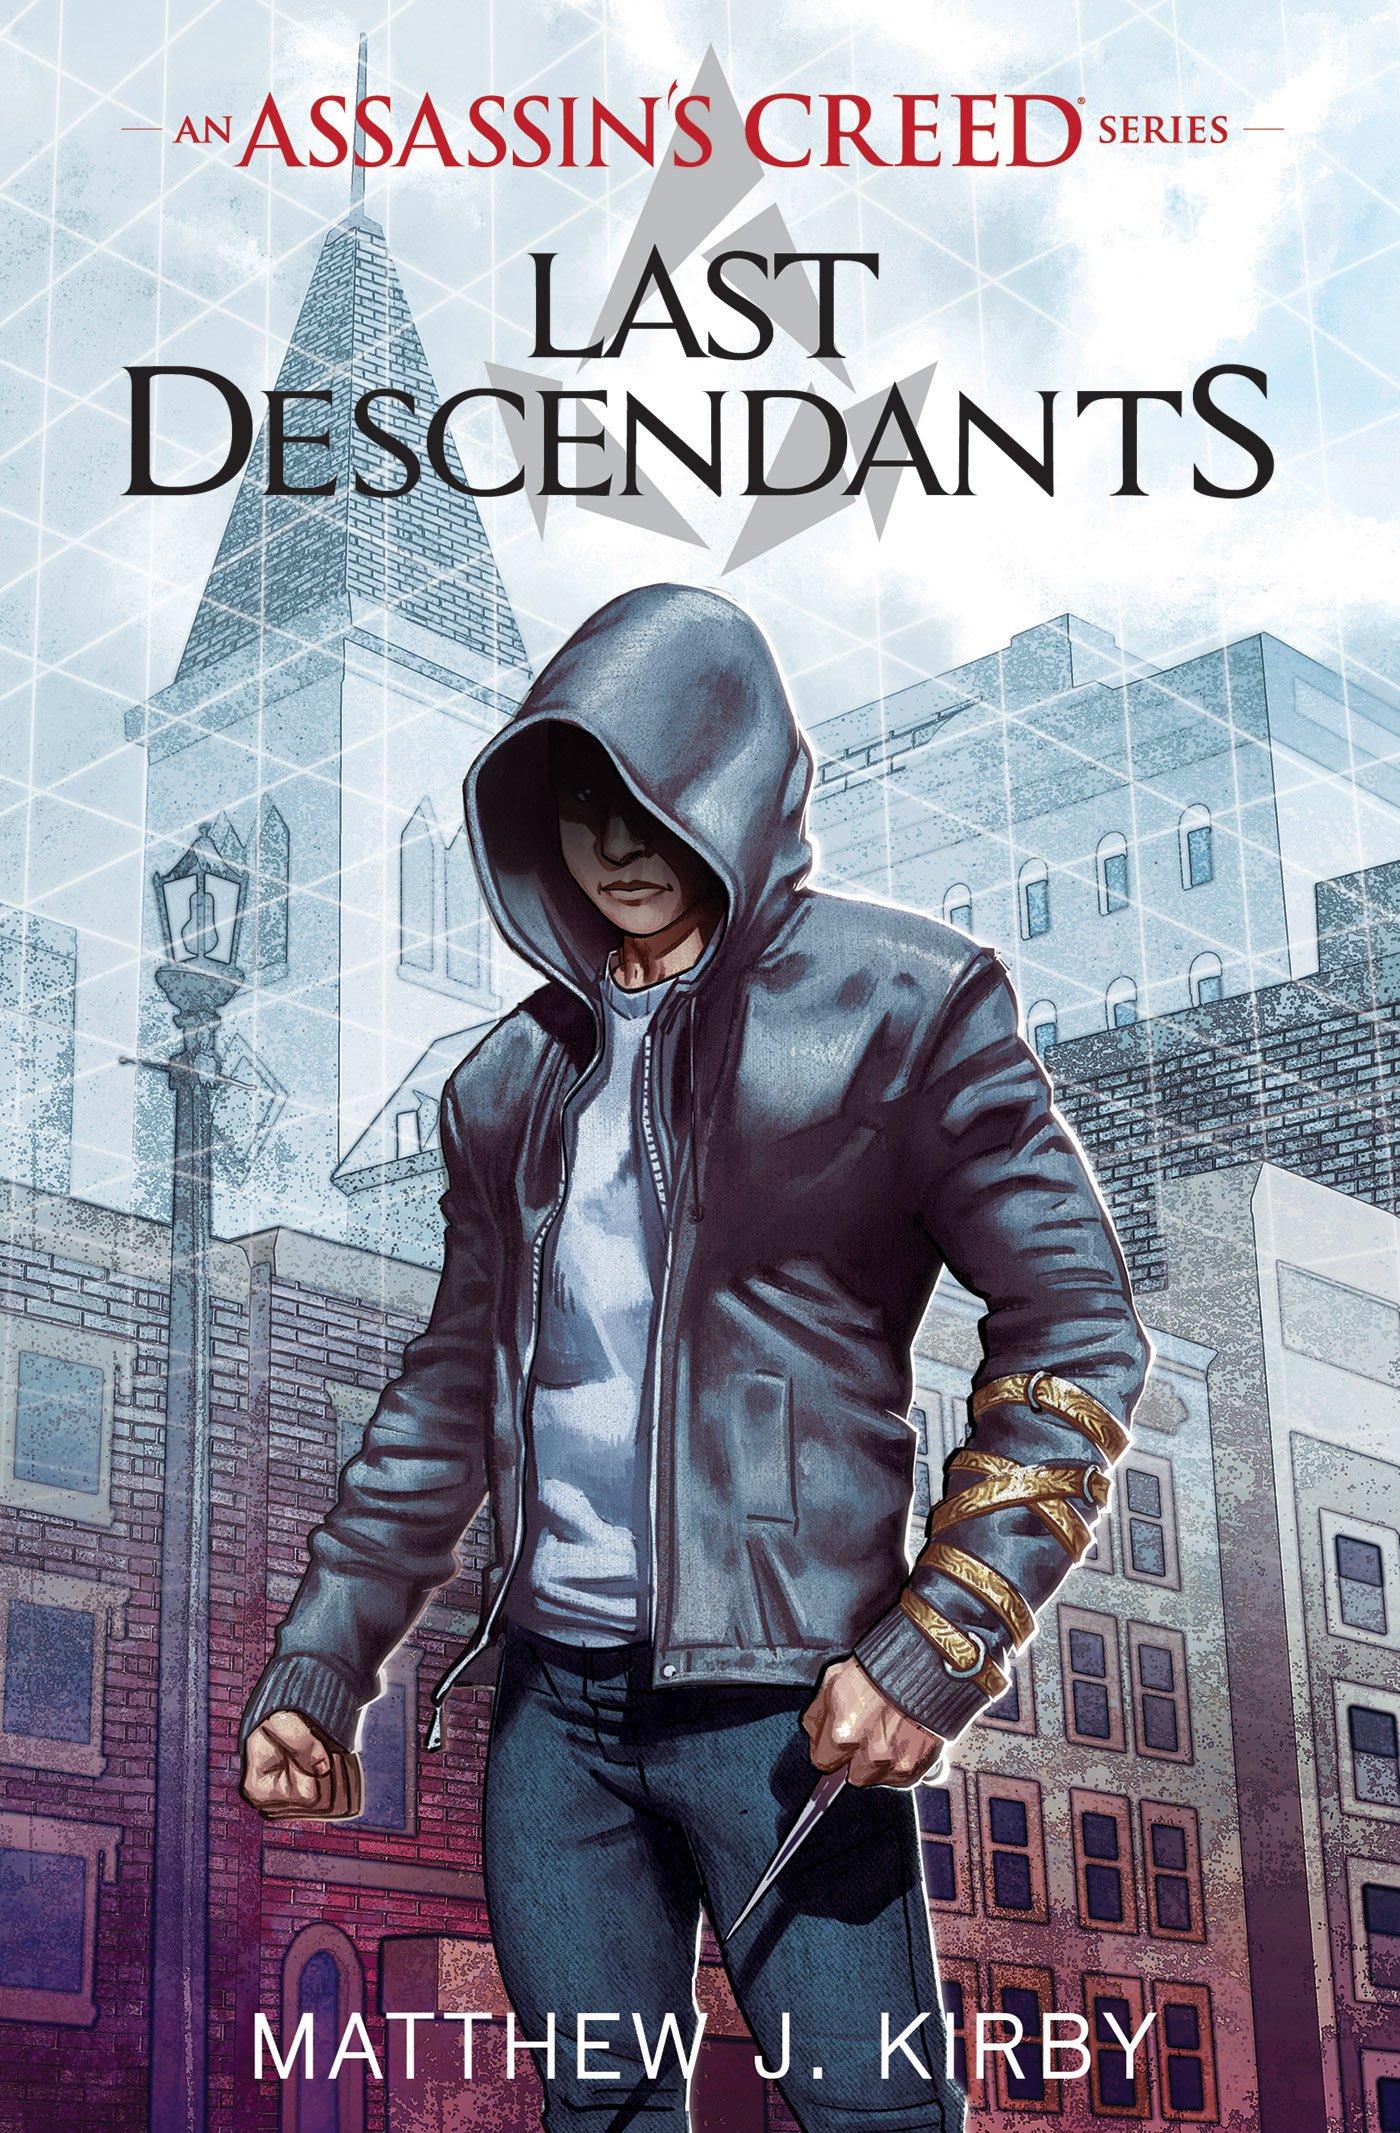 Last Descendants: An Assassin's Creed Novel Series: Matthew Kirby, Matthew  J. Kirby: 9780545855518: Amazon.com: Books